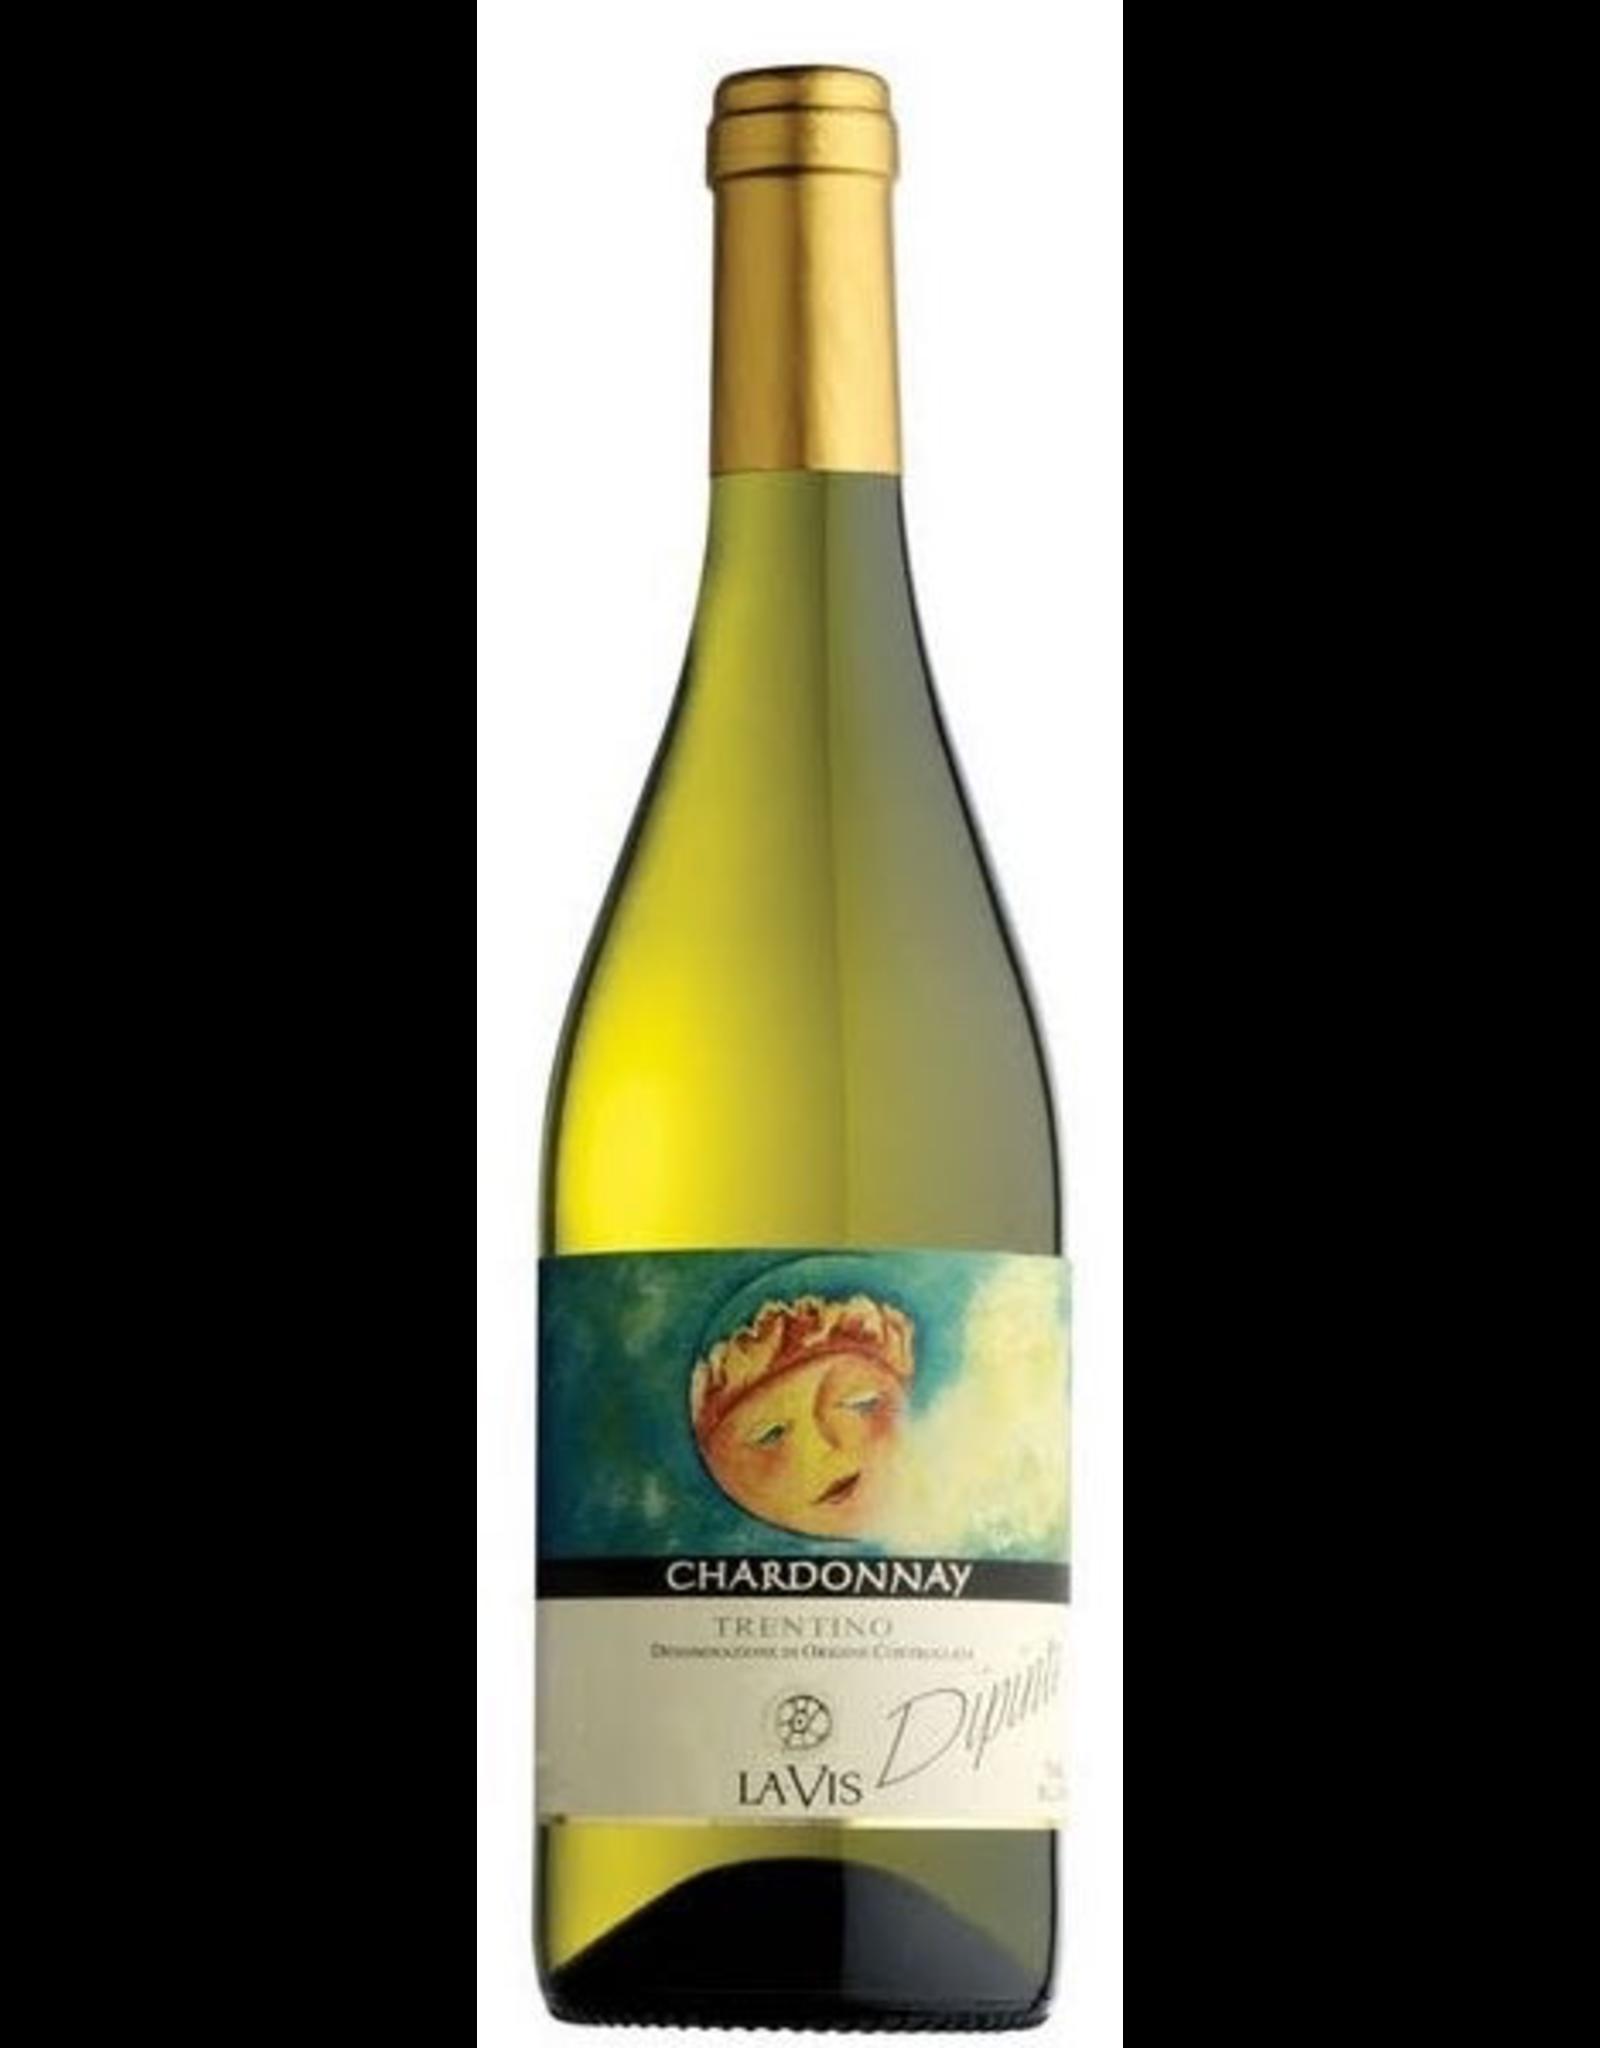 White Wine 2018, La Vis Dipinti, Chardonnay, Vigneti delle Dolomiti IGT, Trentino-Alto Adige, Italy, 12.5% Alc, CTnr, TW90